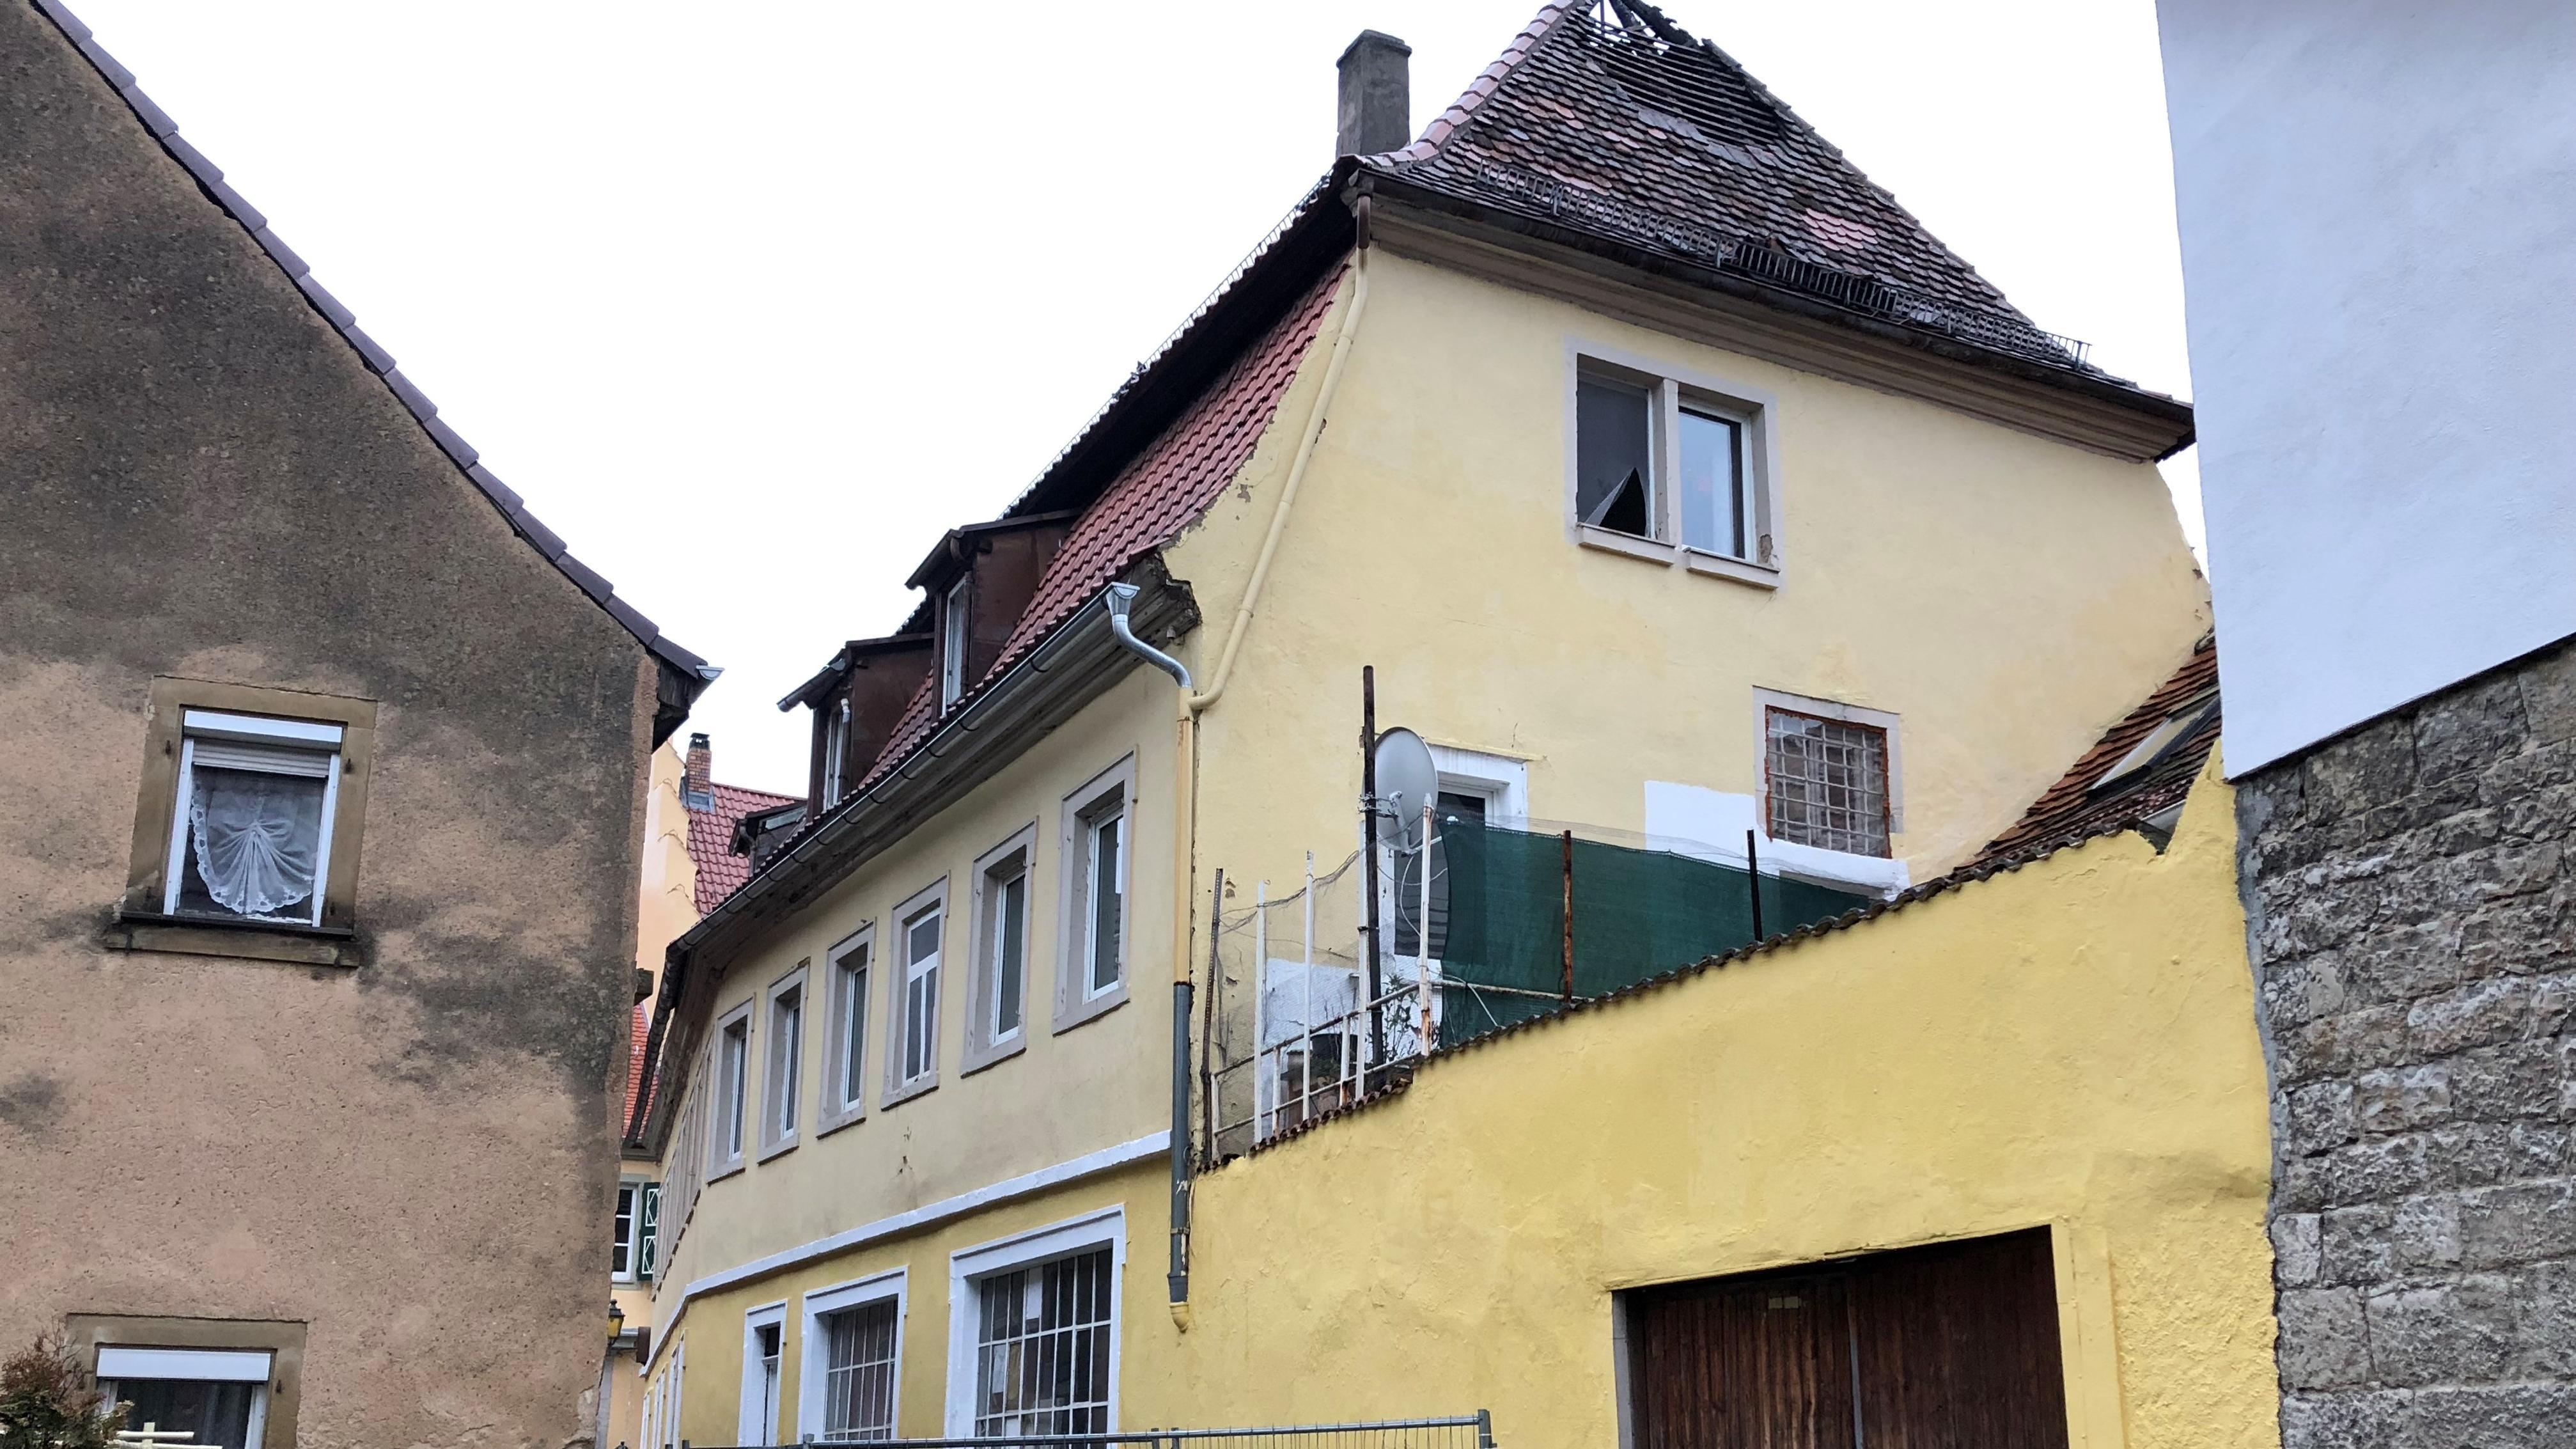 Nach dem Dachstuhlbrand in Ochsenfurt